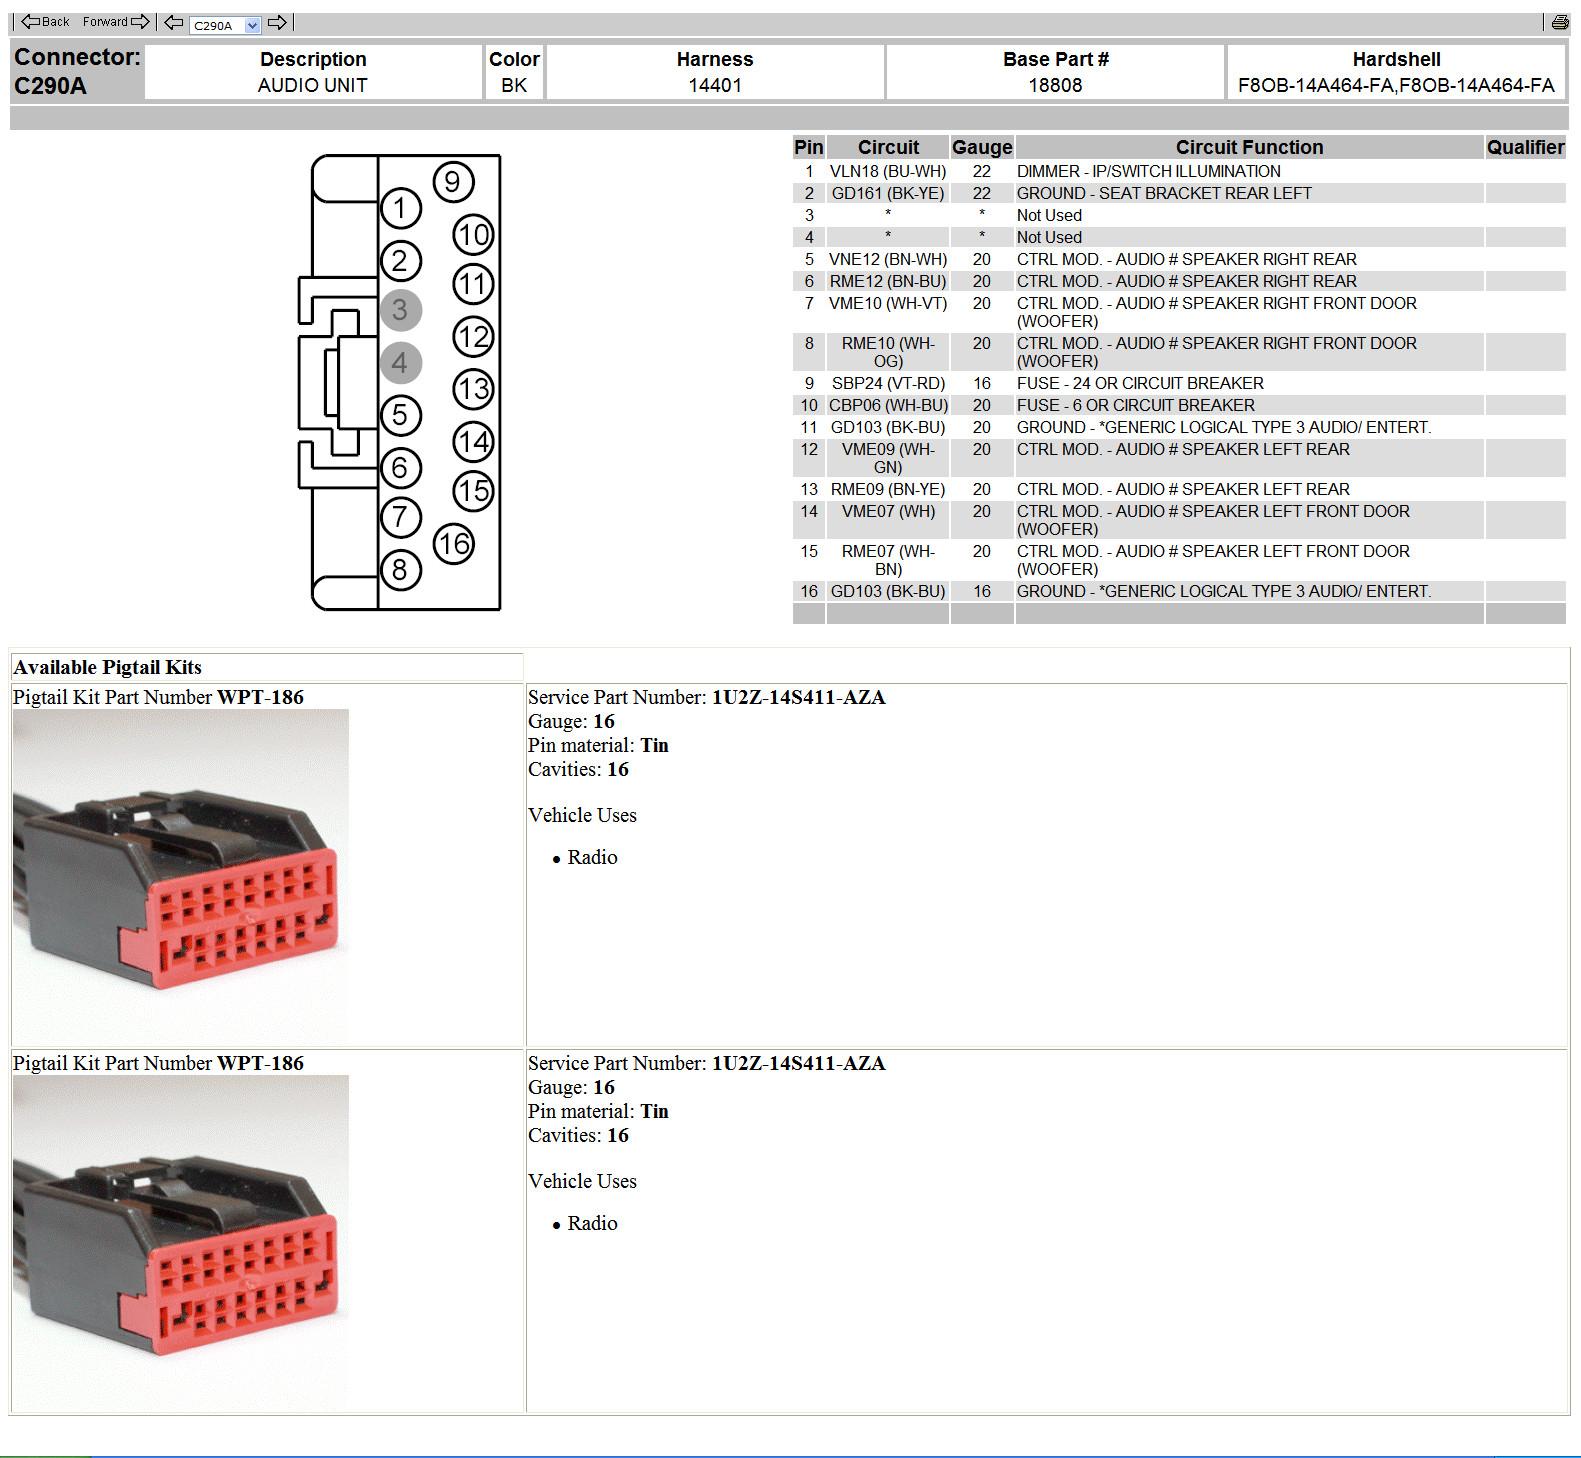 99 Ford Taurus Radio Wiring Diagram Wiring Diagram Approval A Approval A Zaafran It